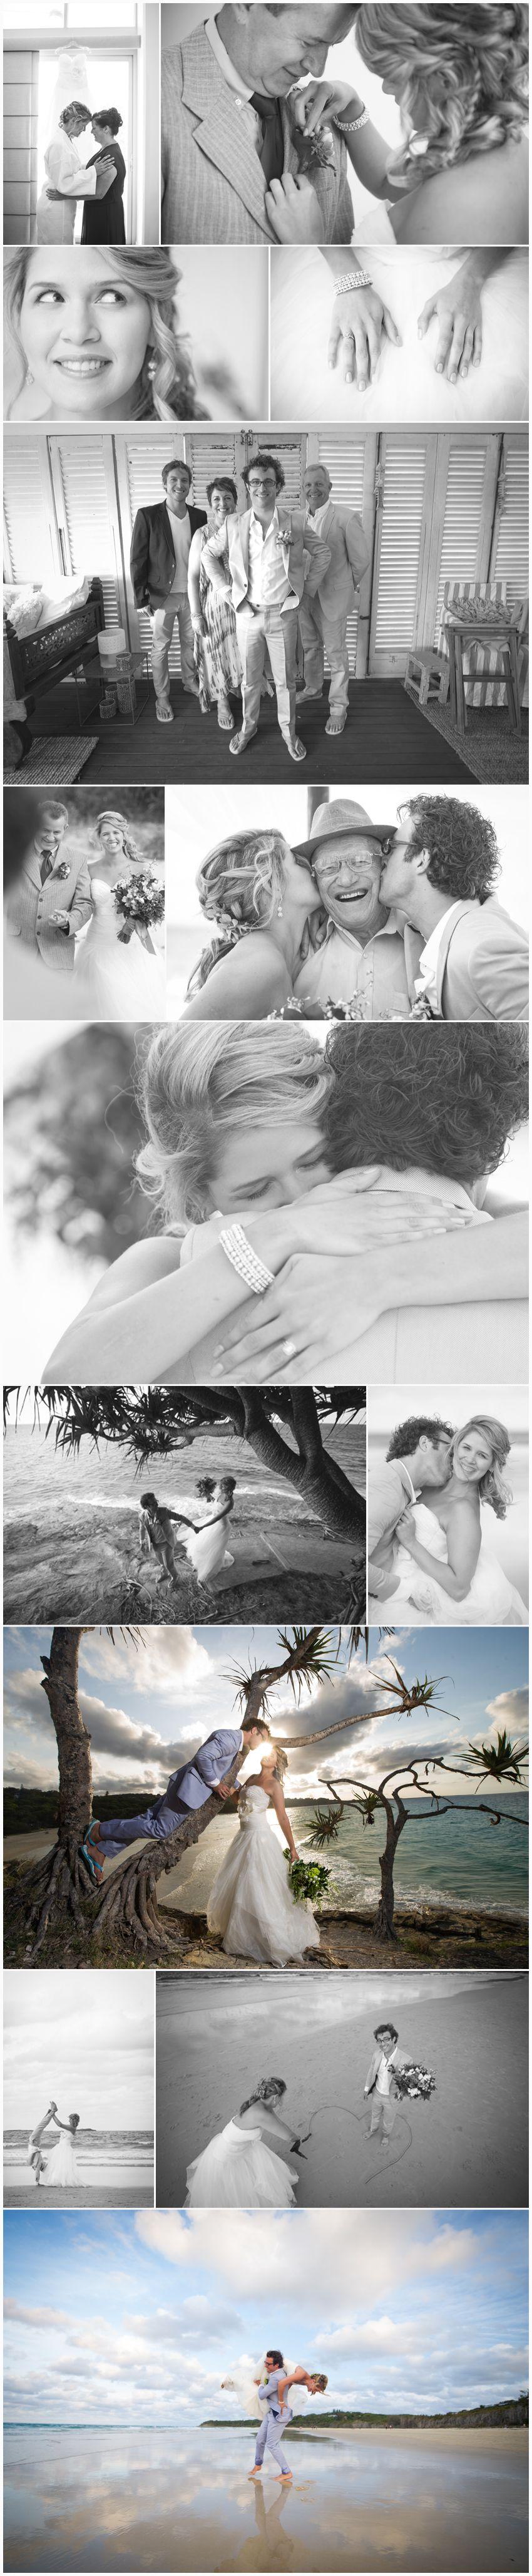 Straddie wedding love story